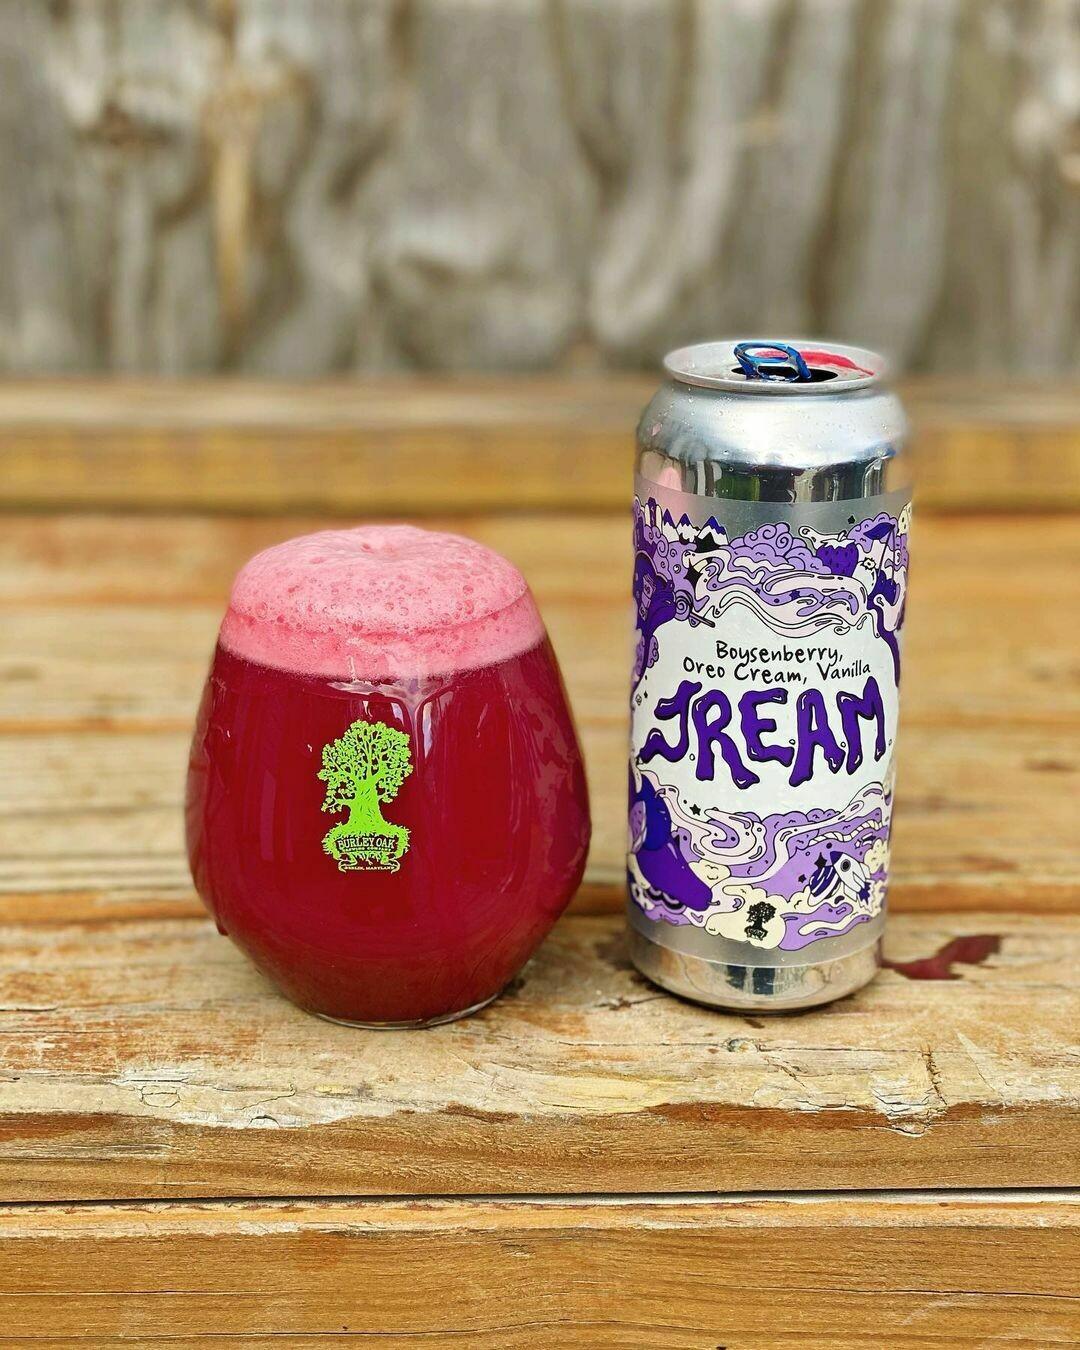 Burley Oak Brewing Company Boysenberry Oreo Cream Vanilla JREAM Sour Ale (SINGLE)